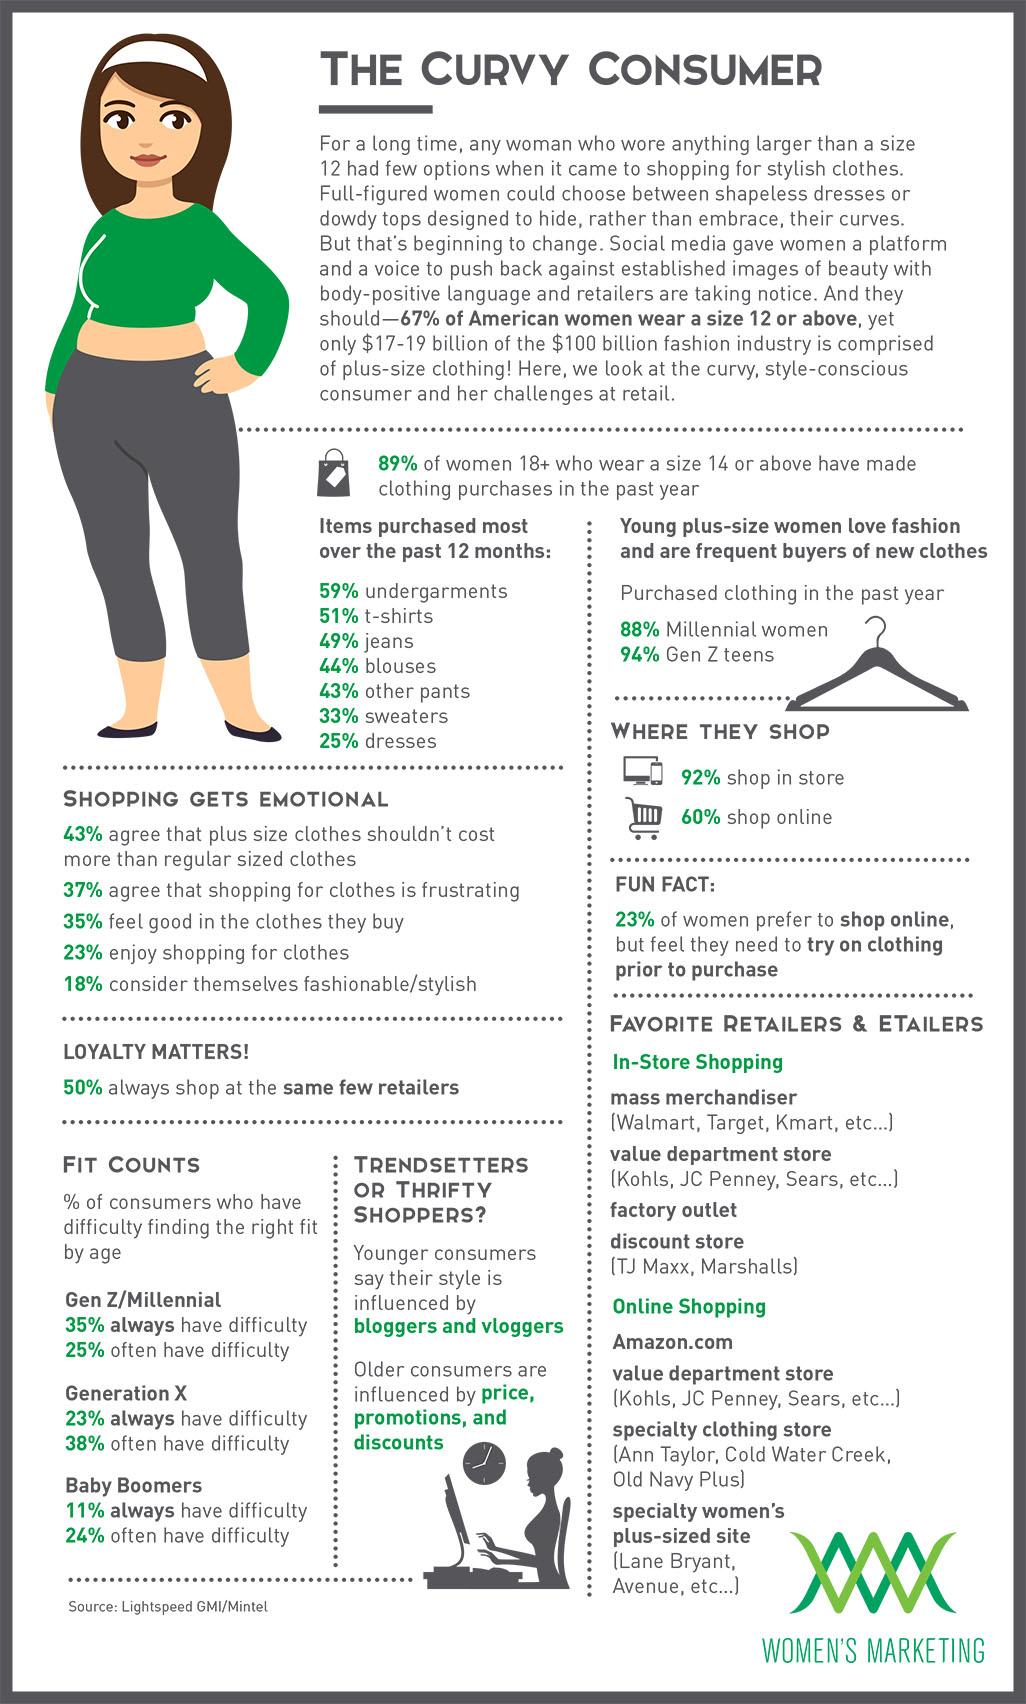 TheCurvyConsumer_Infographic.jpg